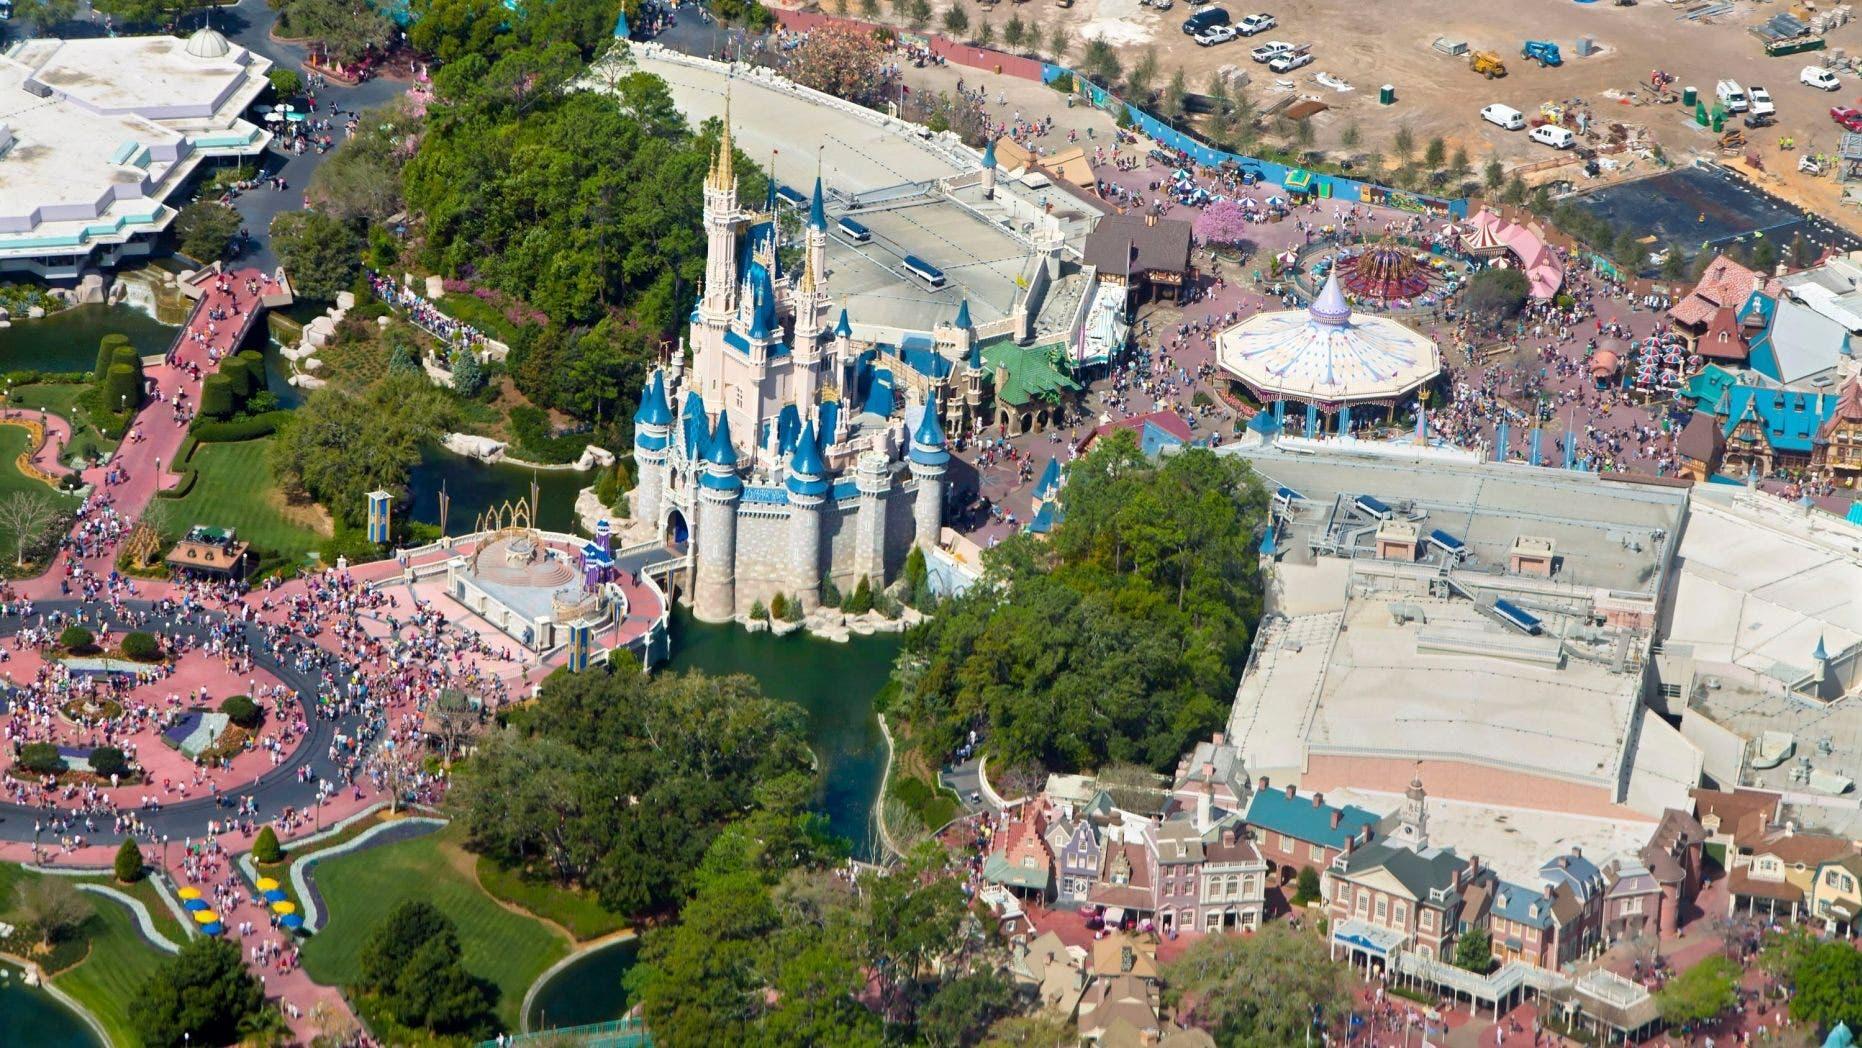 Disney World reopens, company pledges $1 million to Bahamas relief